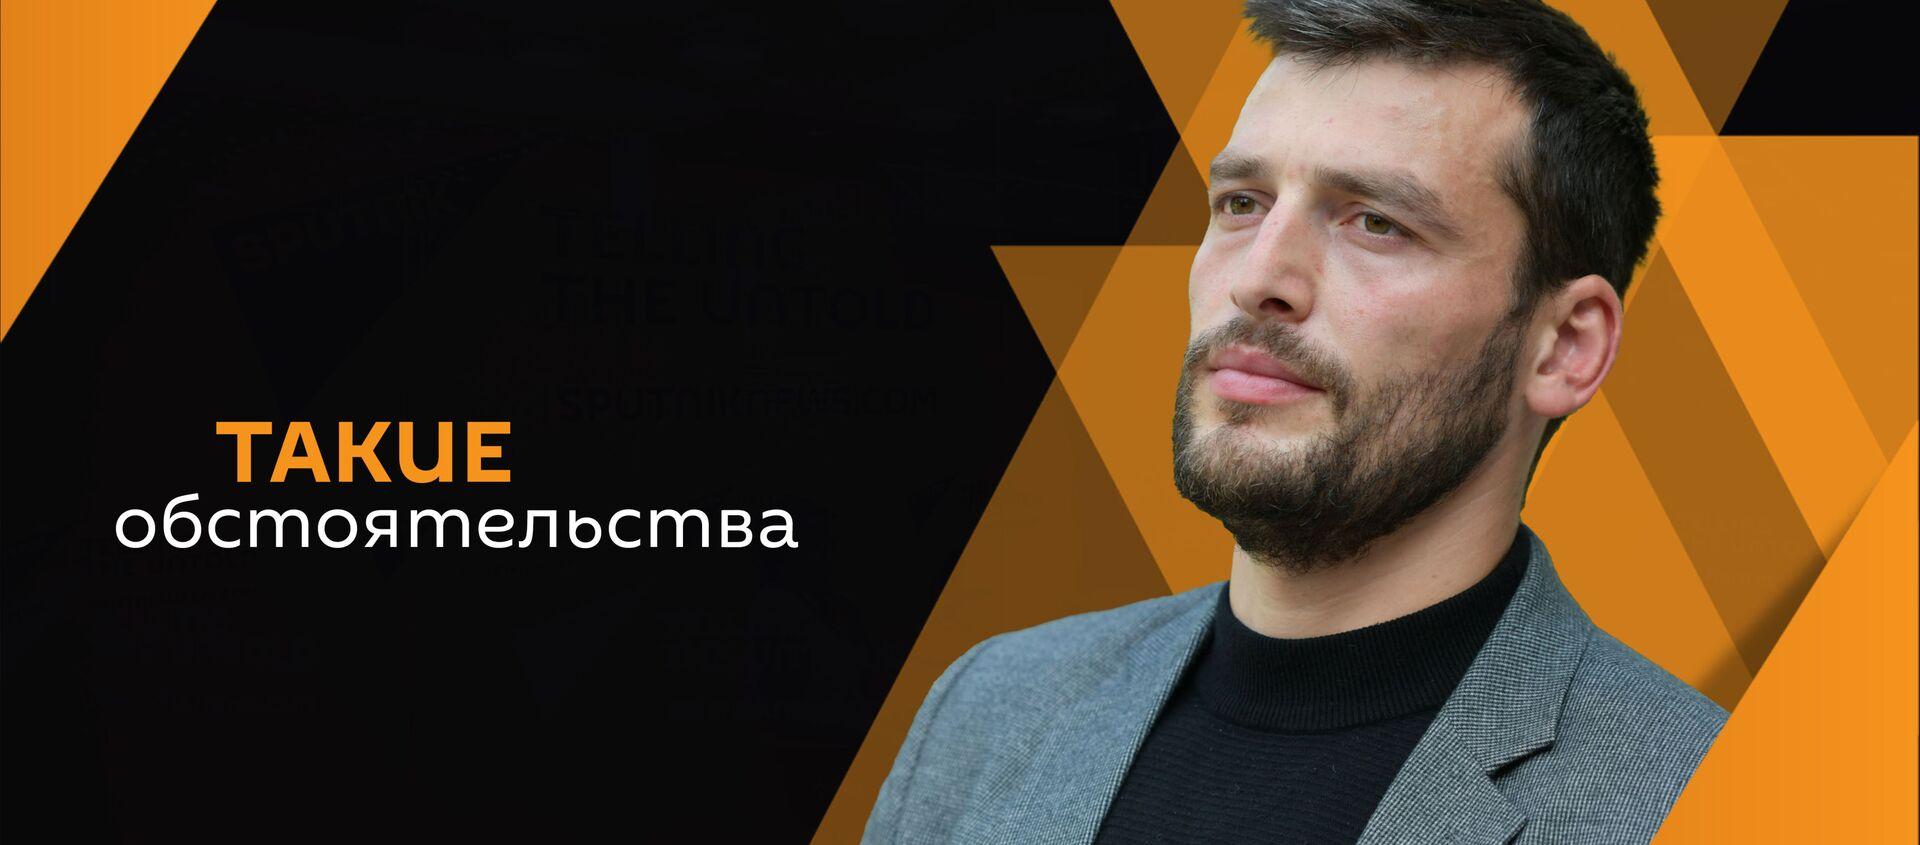 Михаил Кирия - Sputnik Абхазия, 1920, 10.06.2021